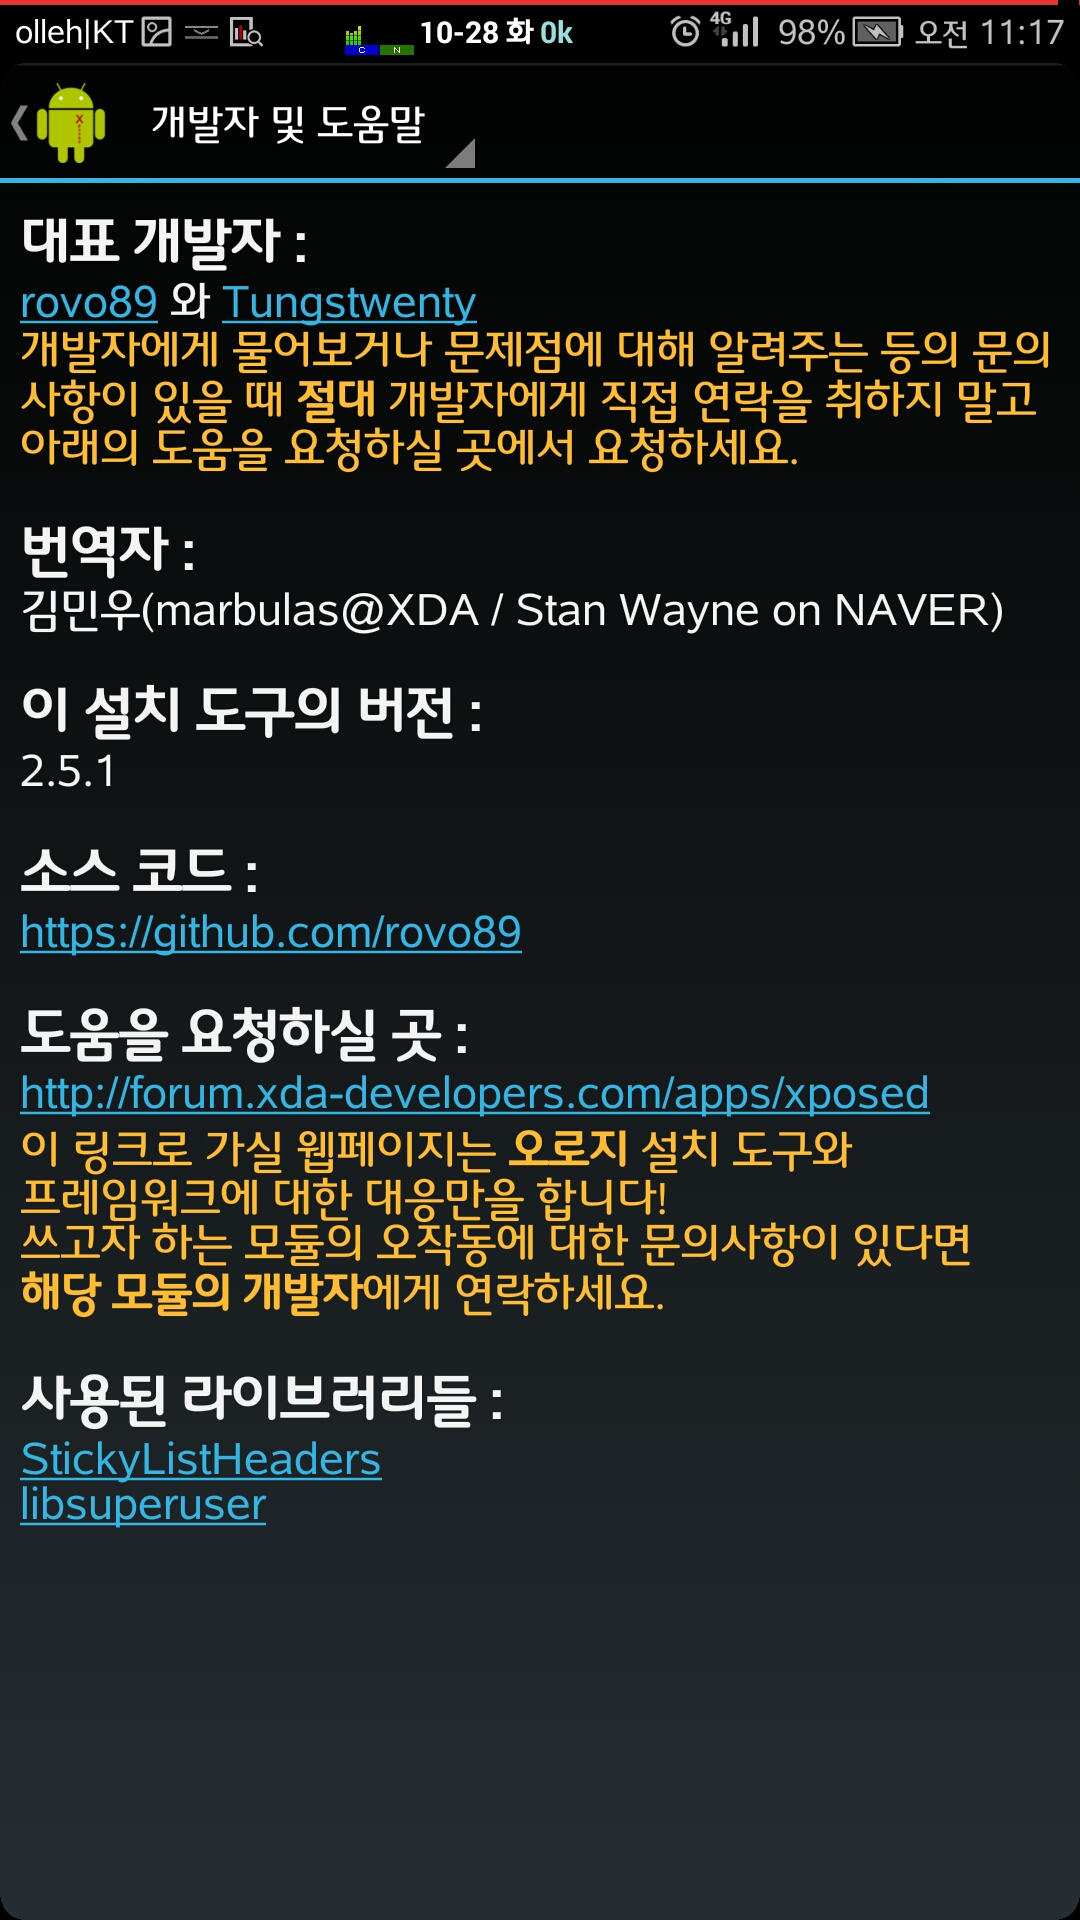 Screenshot_2014-10-28-11-17-11.jpeg